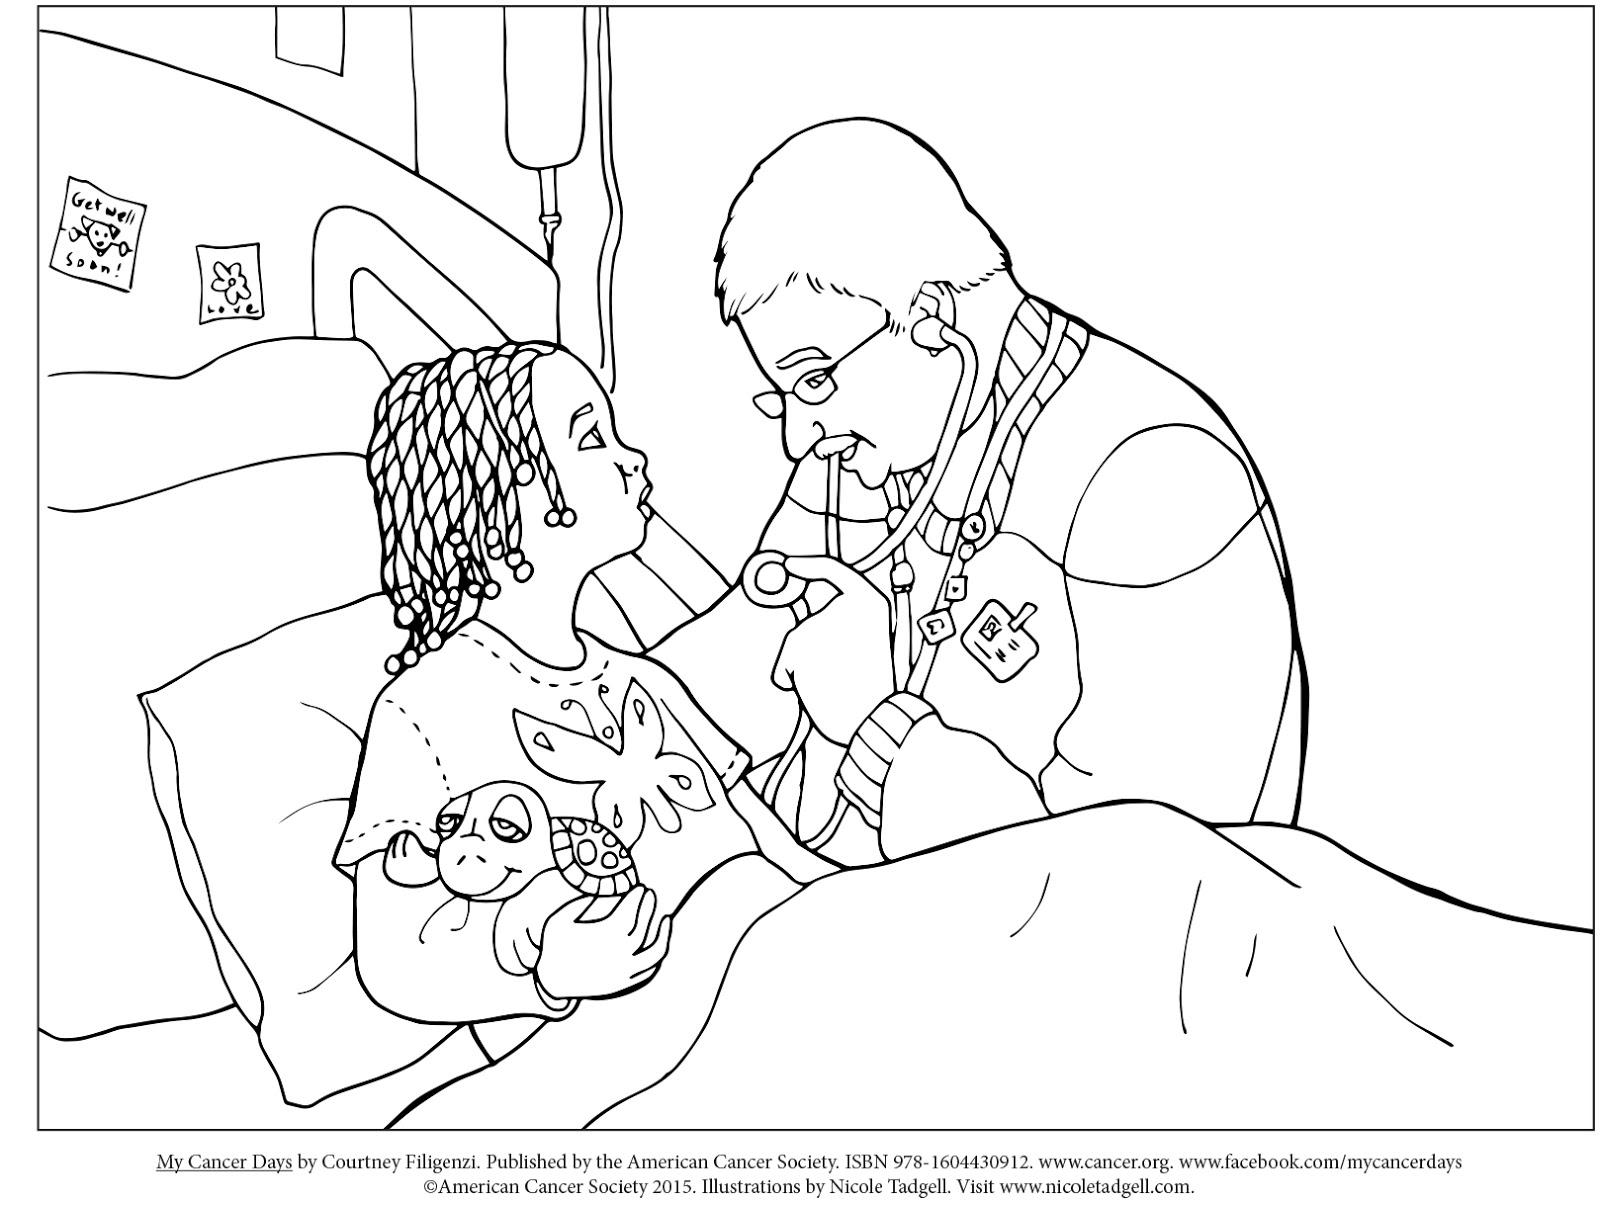 nicole tadgell illustration